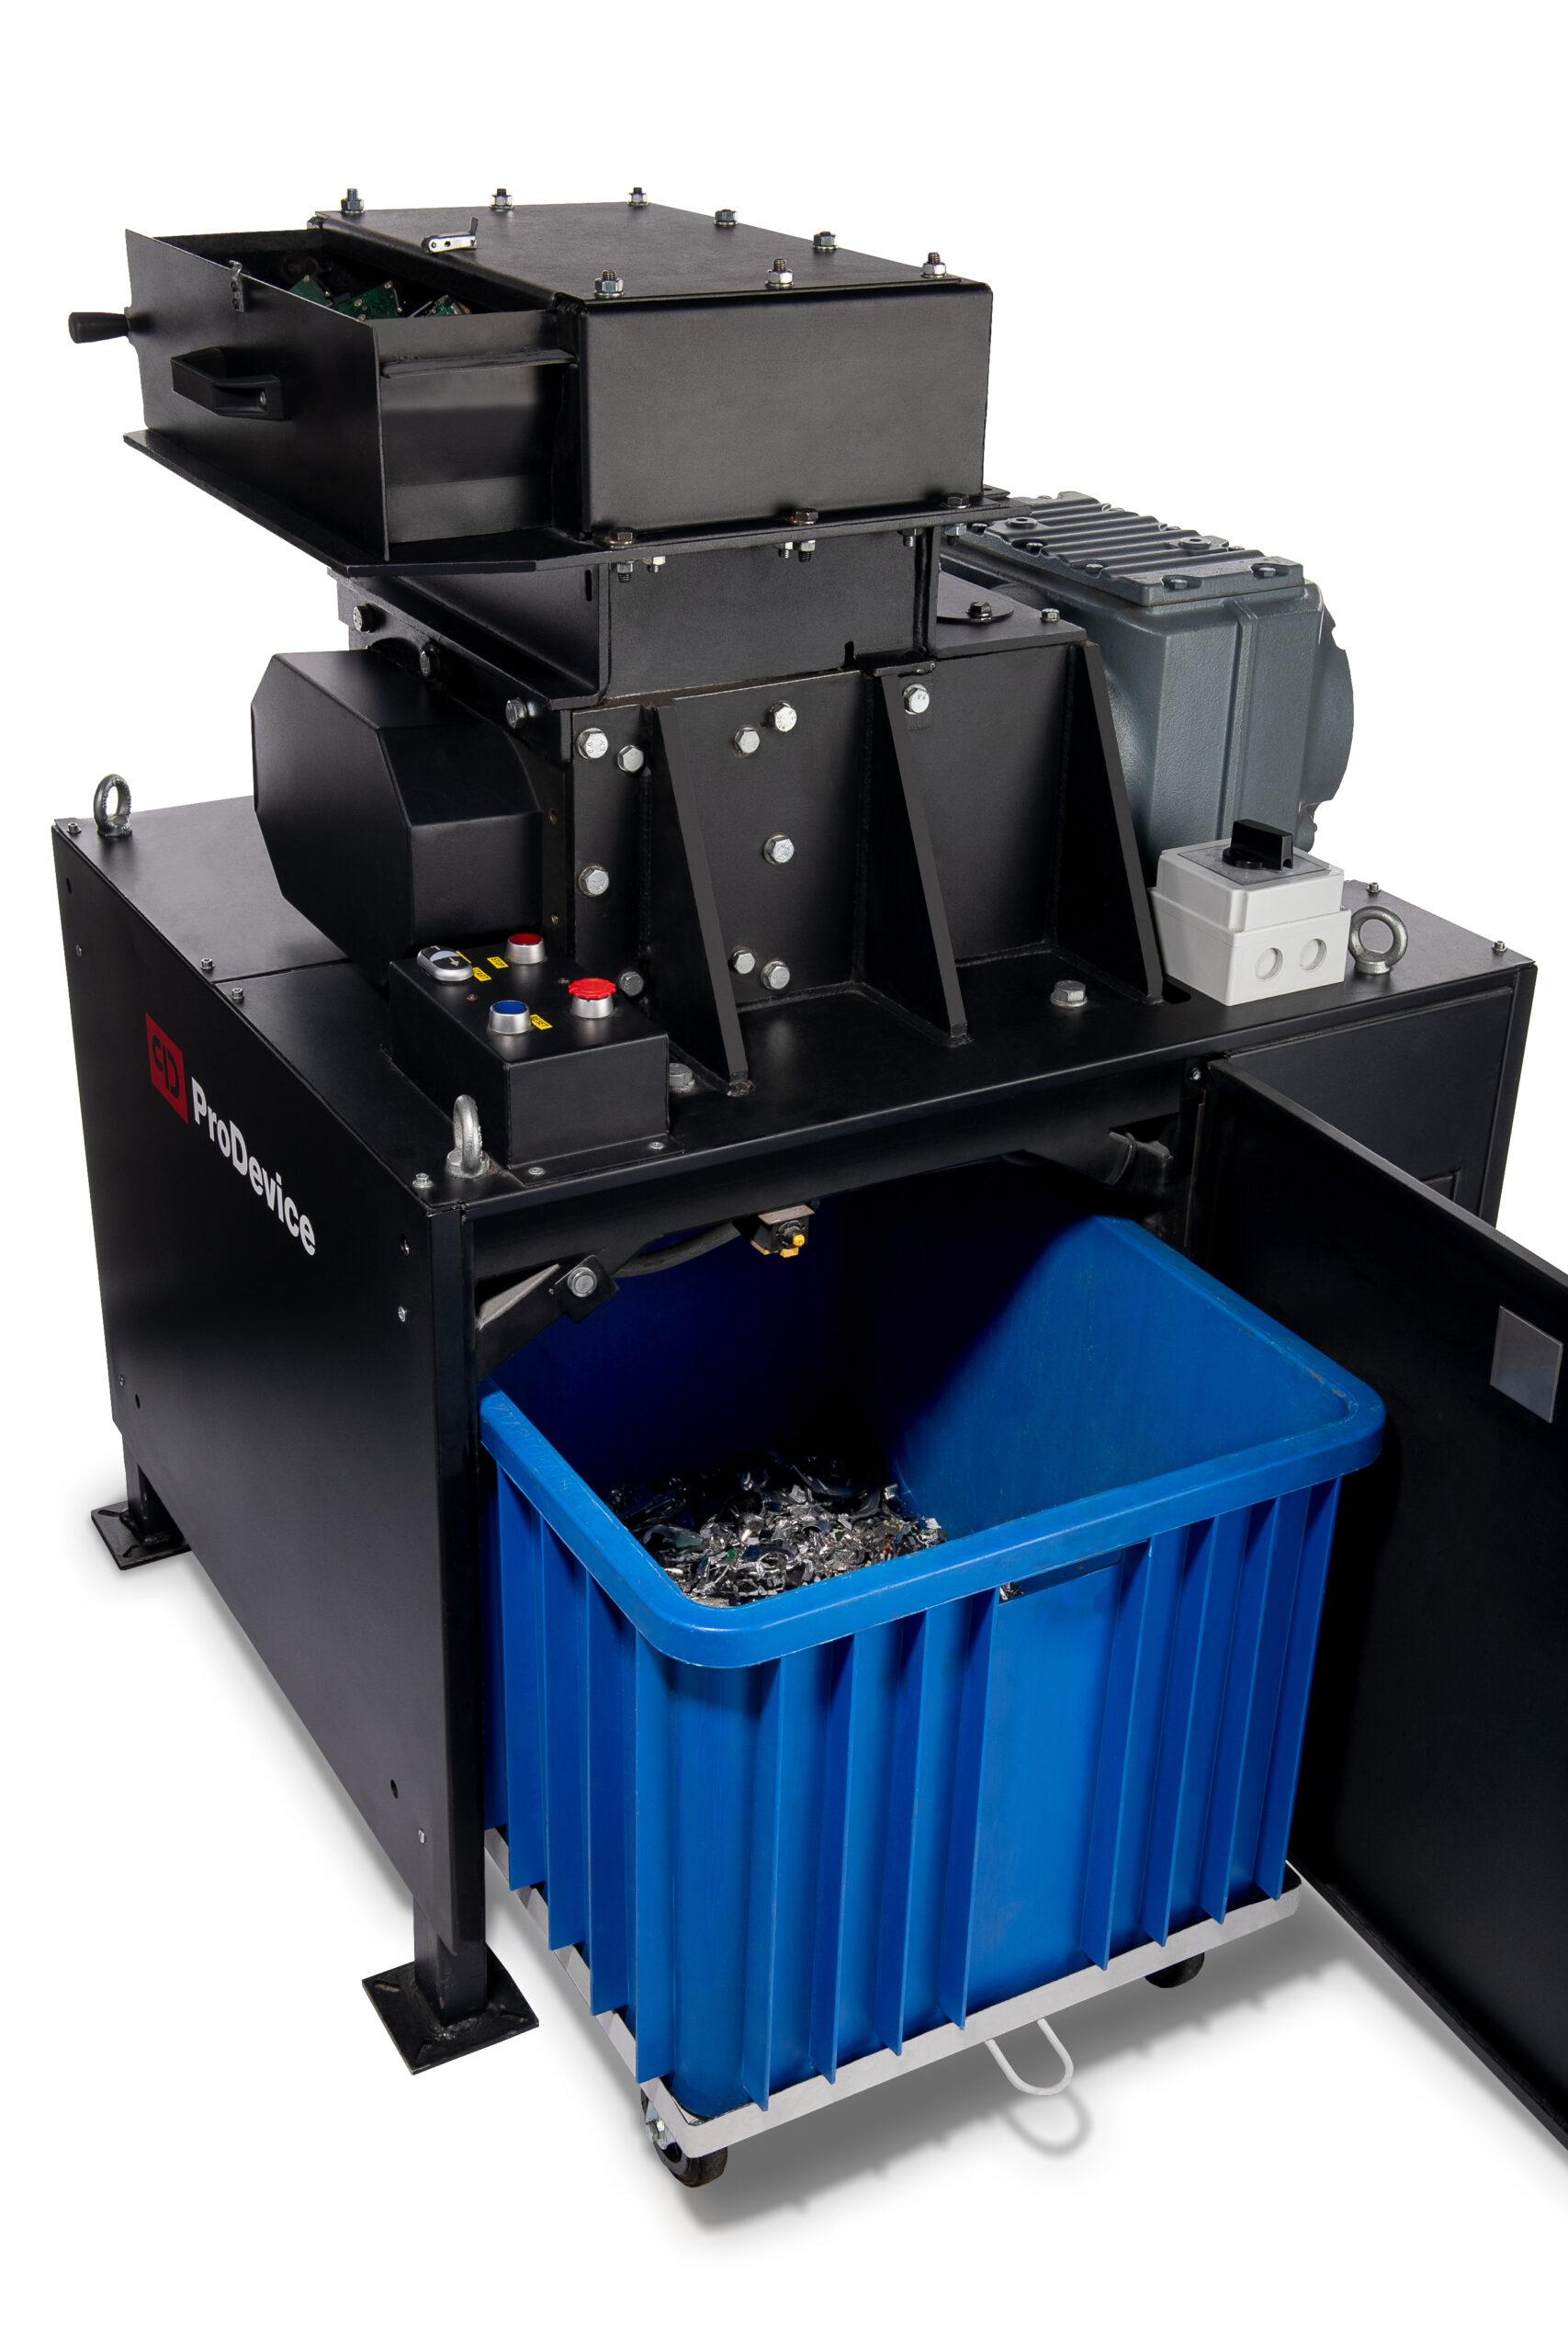 https://www.pro-device.com/wp-content/uploads/2021/06/Prodevice-DGX02-shredder-scaled.jpg